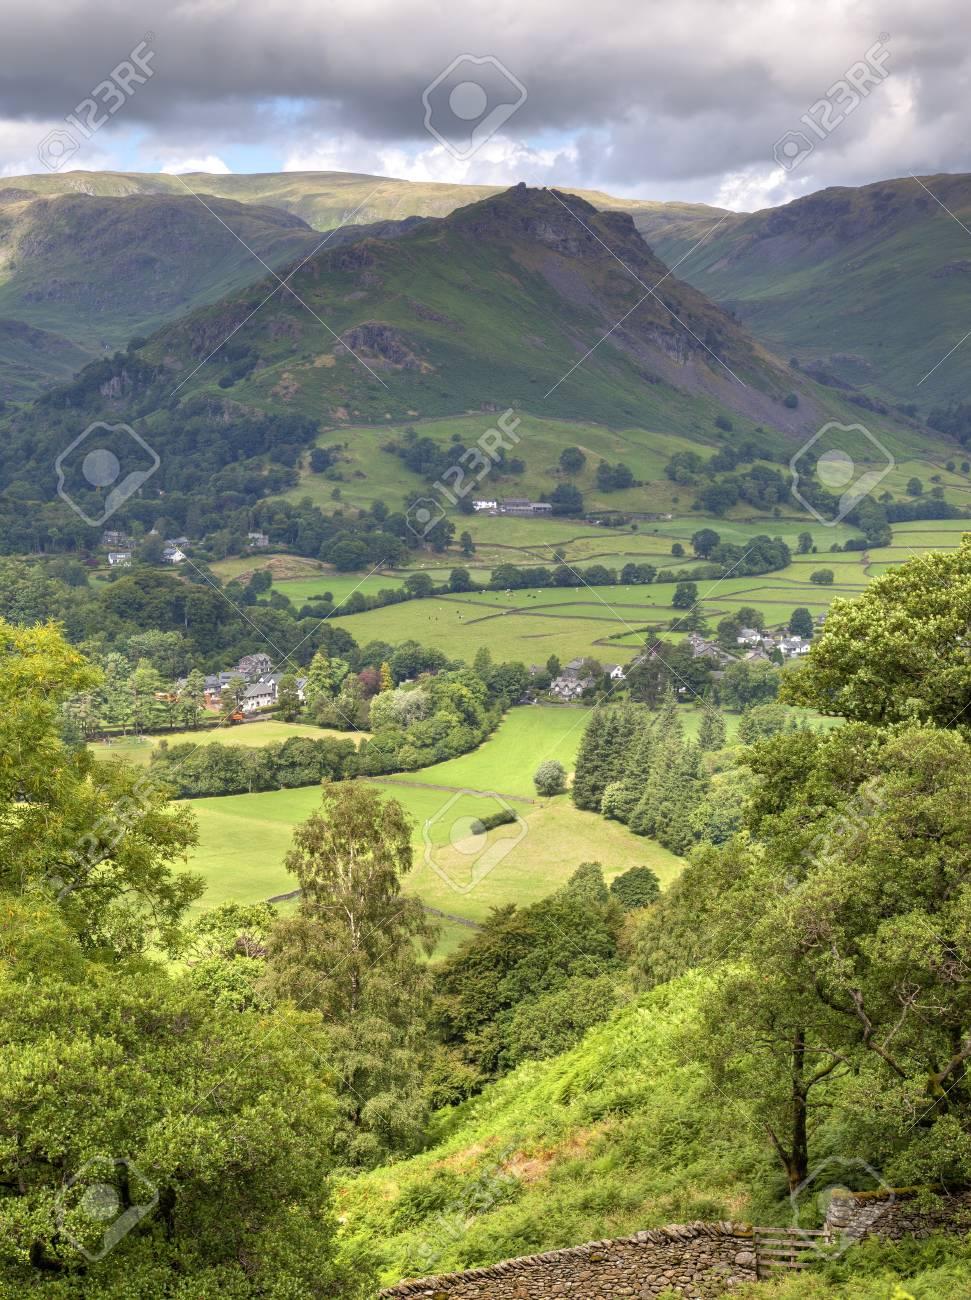 Aerial view of Grasmere, Cumbria, England Stock Photo - 24516476